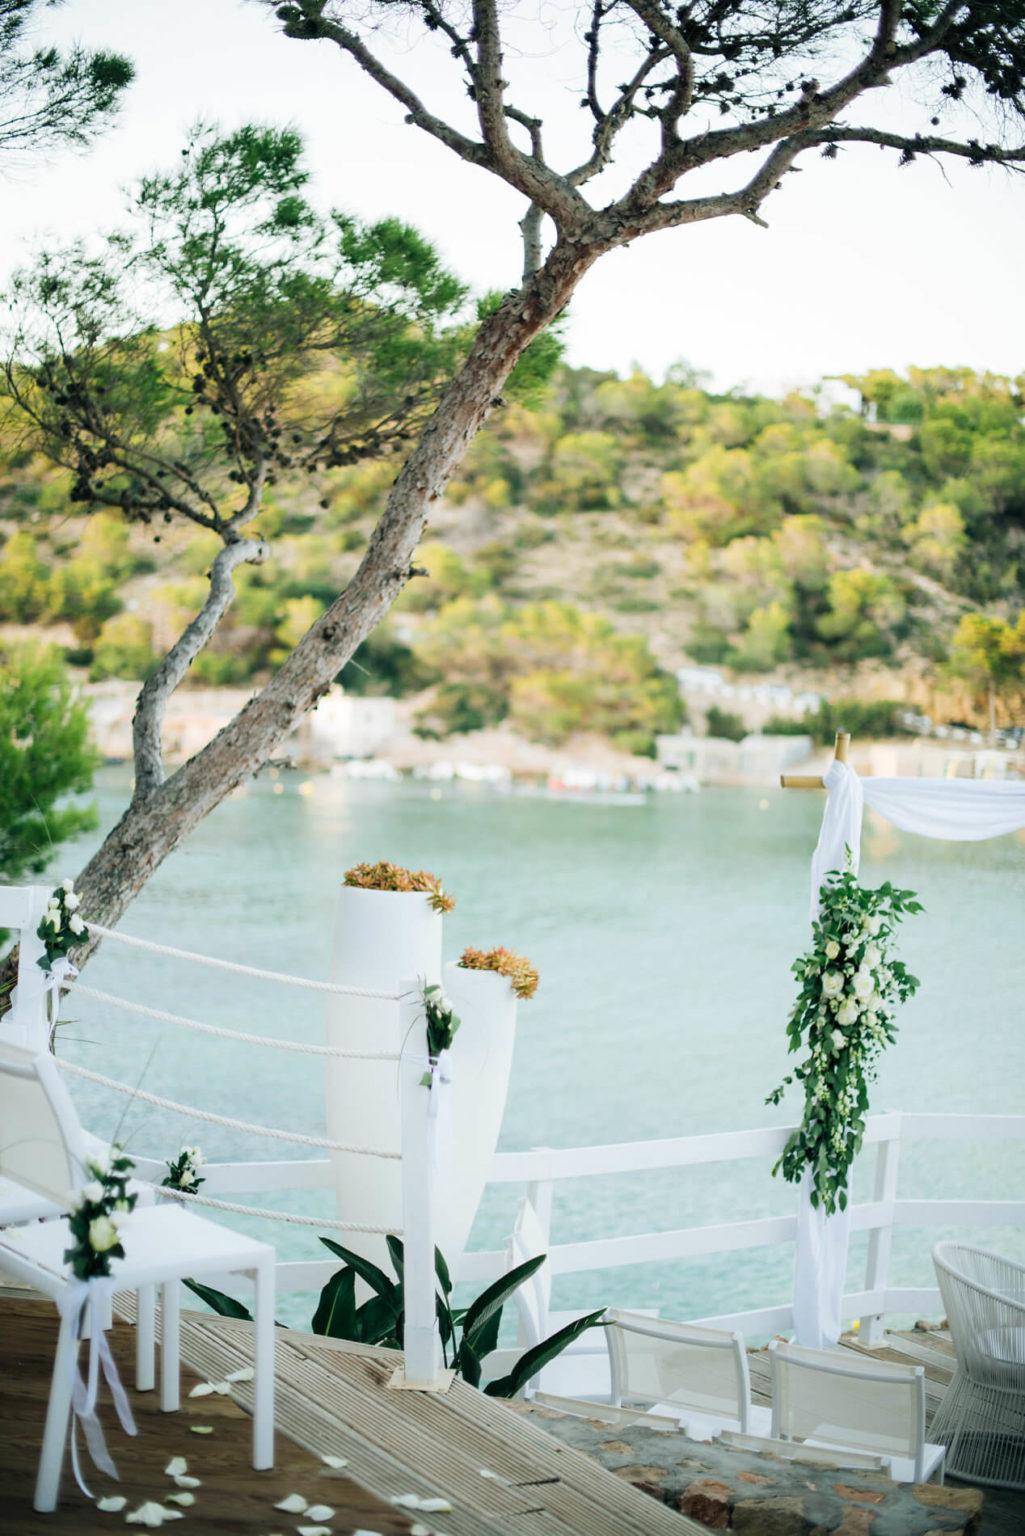 https://www.white-ibiza.com/wp-content/uploads/2020/03/ibiza-wedding-venue-maya-beach-club-2020-09-1025x1536.jpg